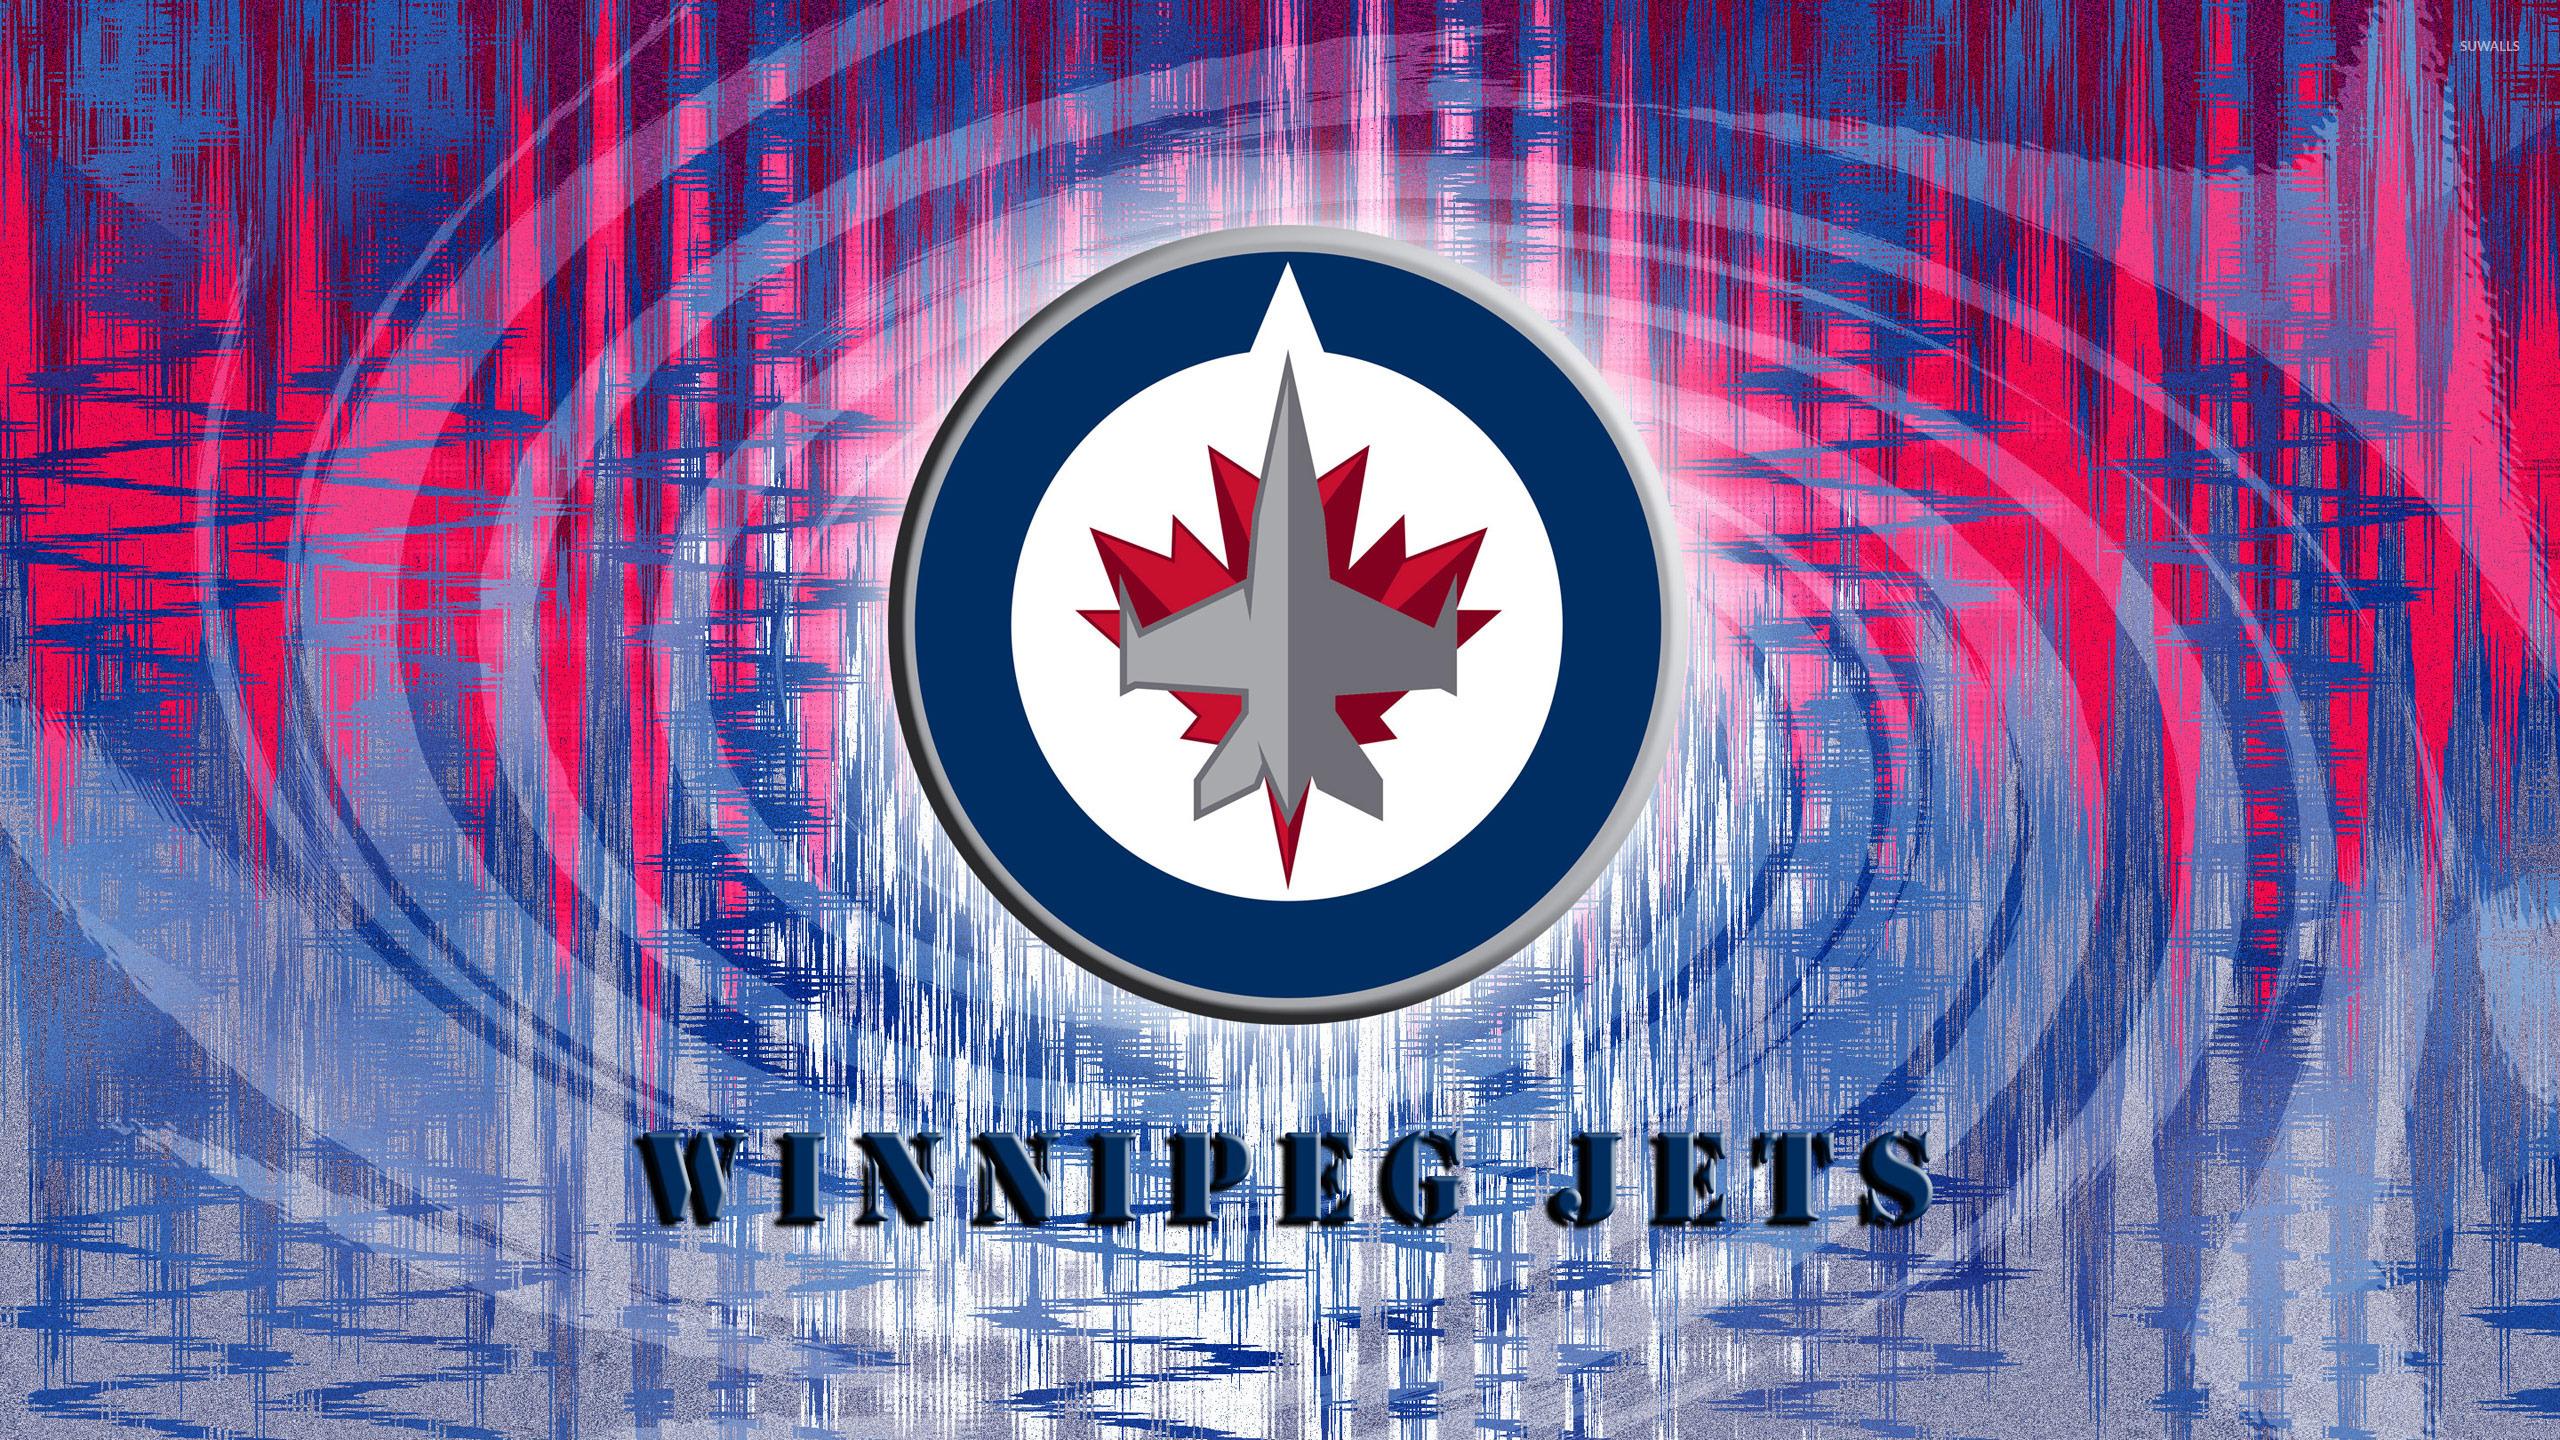 Winnipeg Jets wallpaper   Sport wallpapers   19508 1280x800